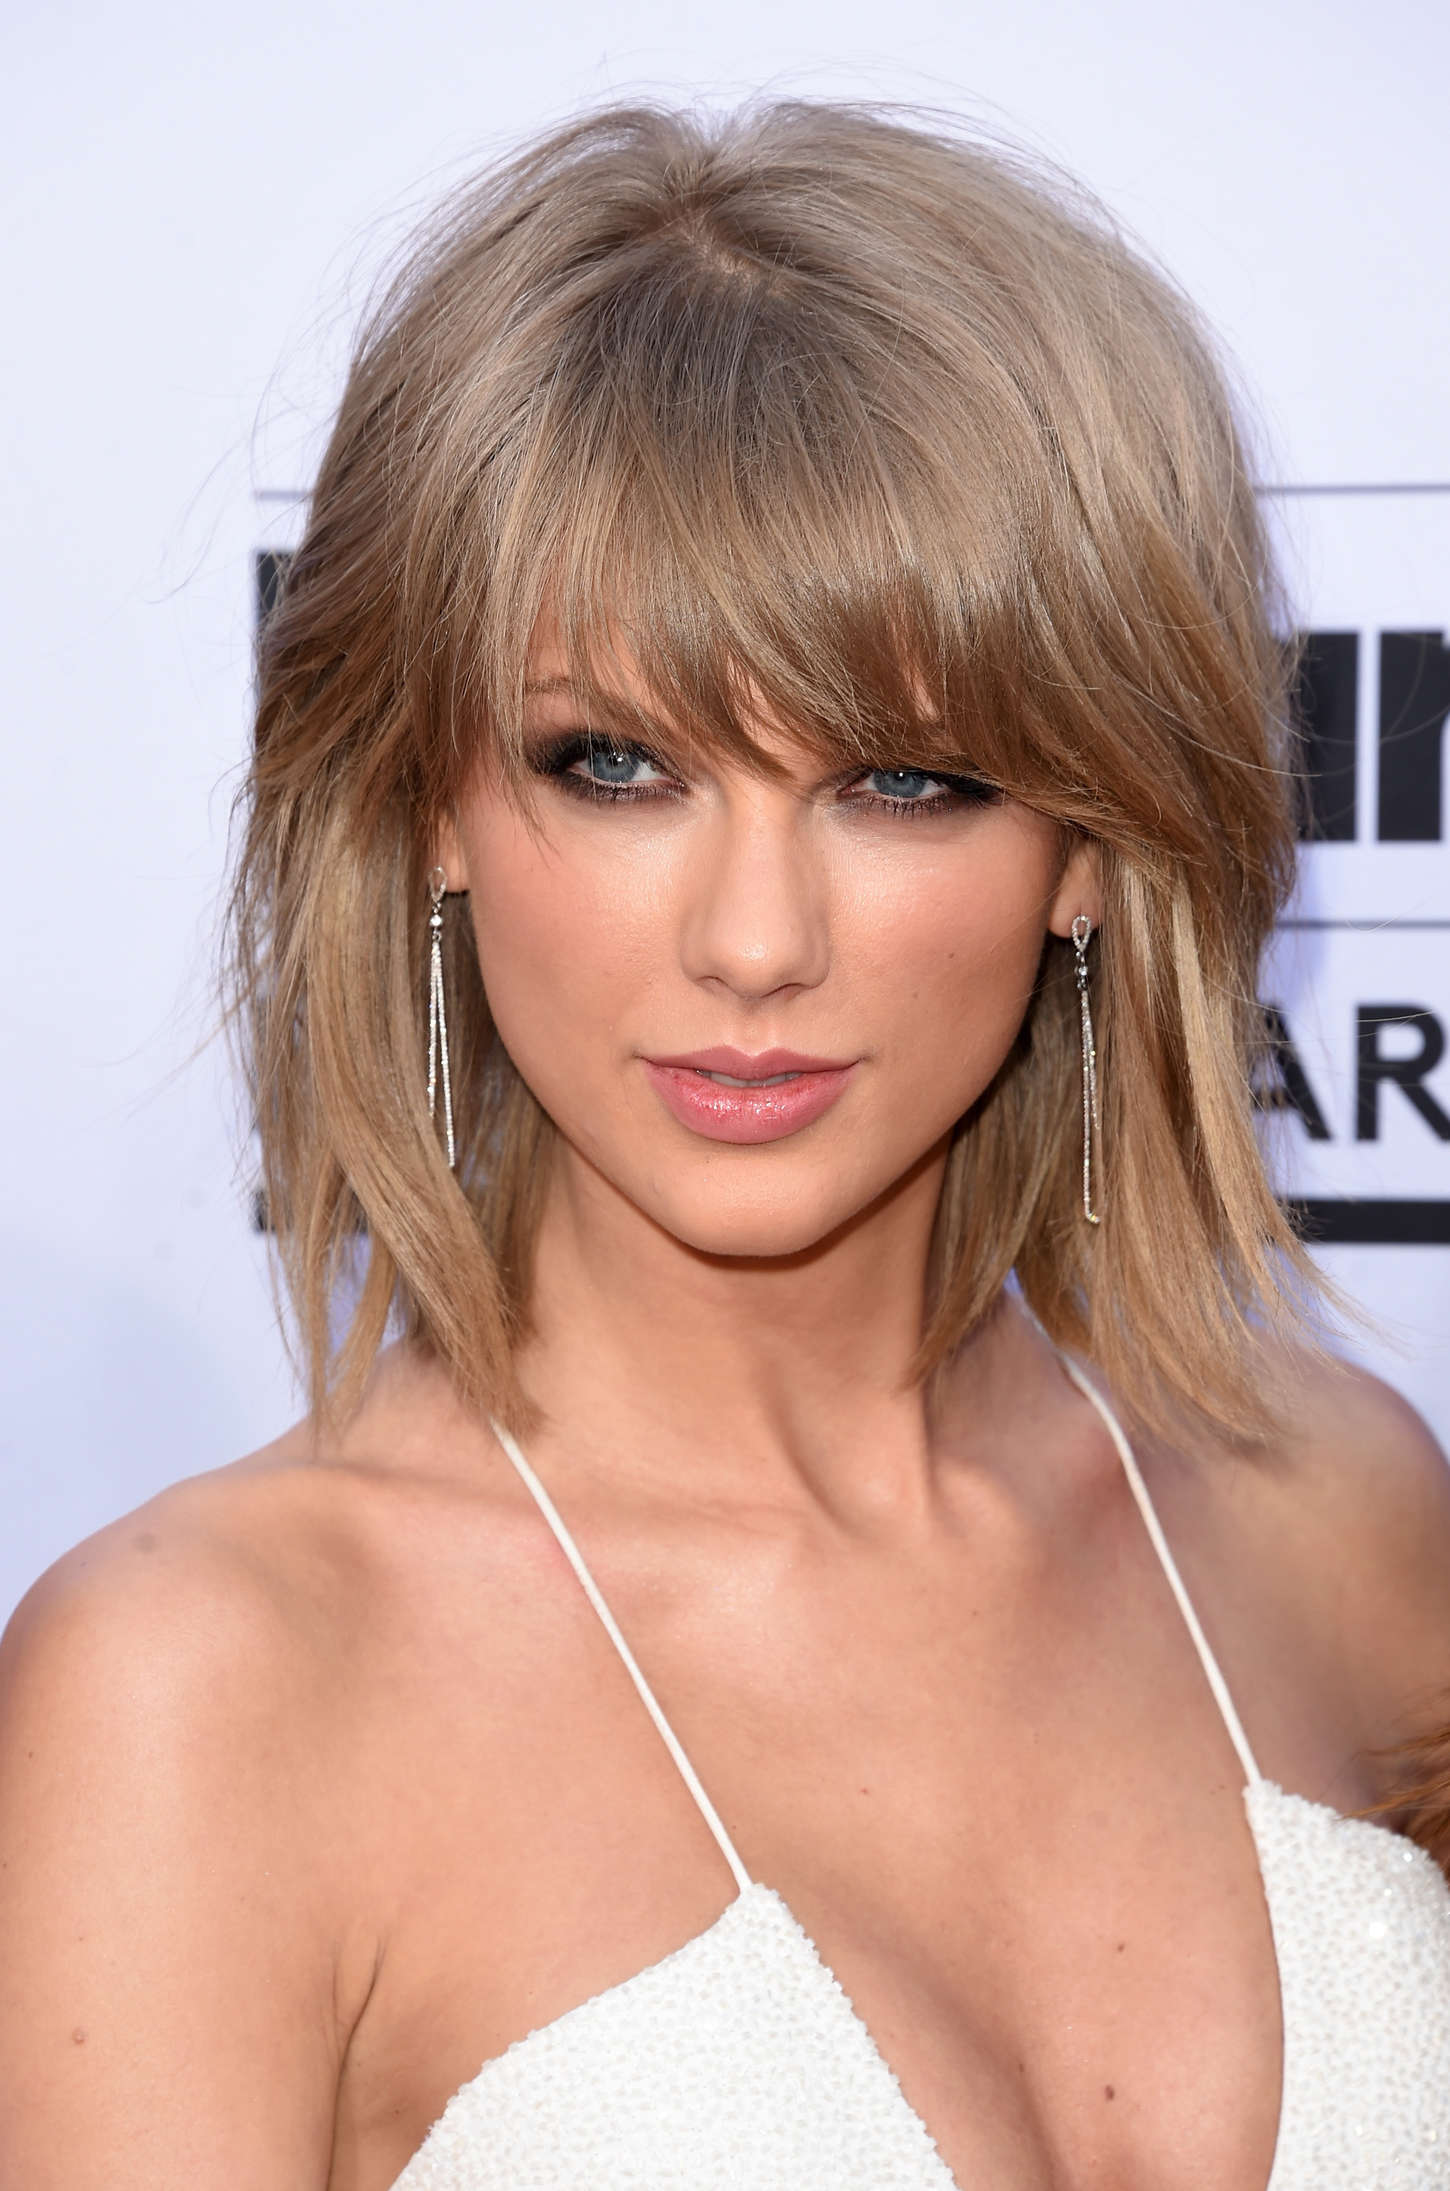 Taylor Swift Billboard Music Awards 2015 04 Gotceleb